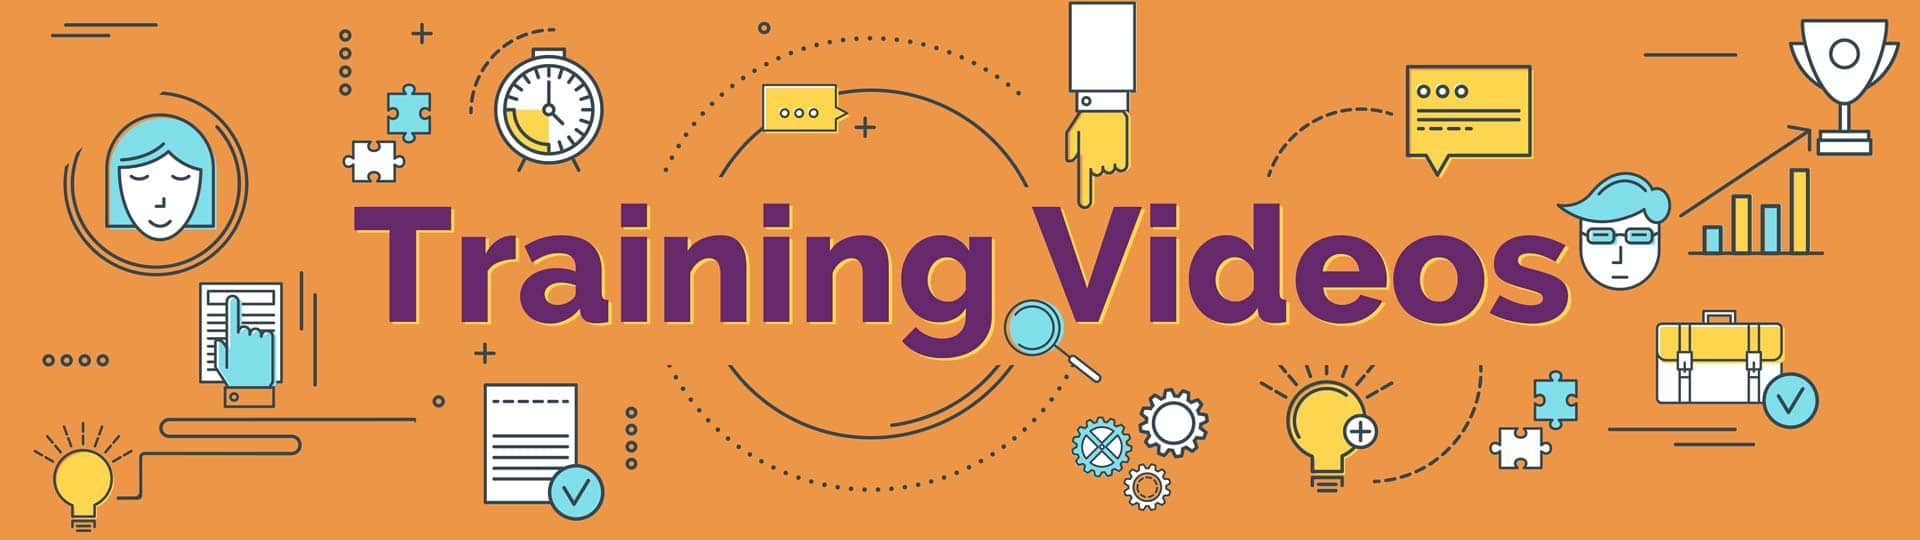 Training-videos